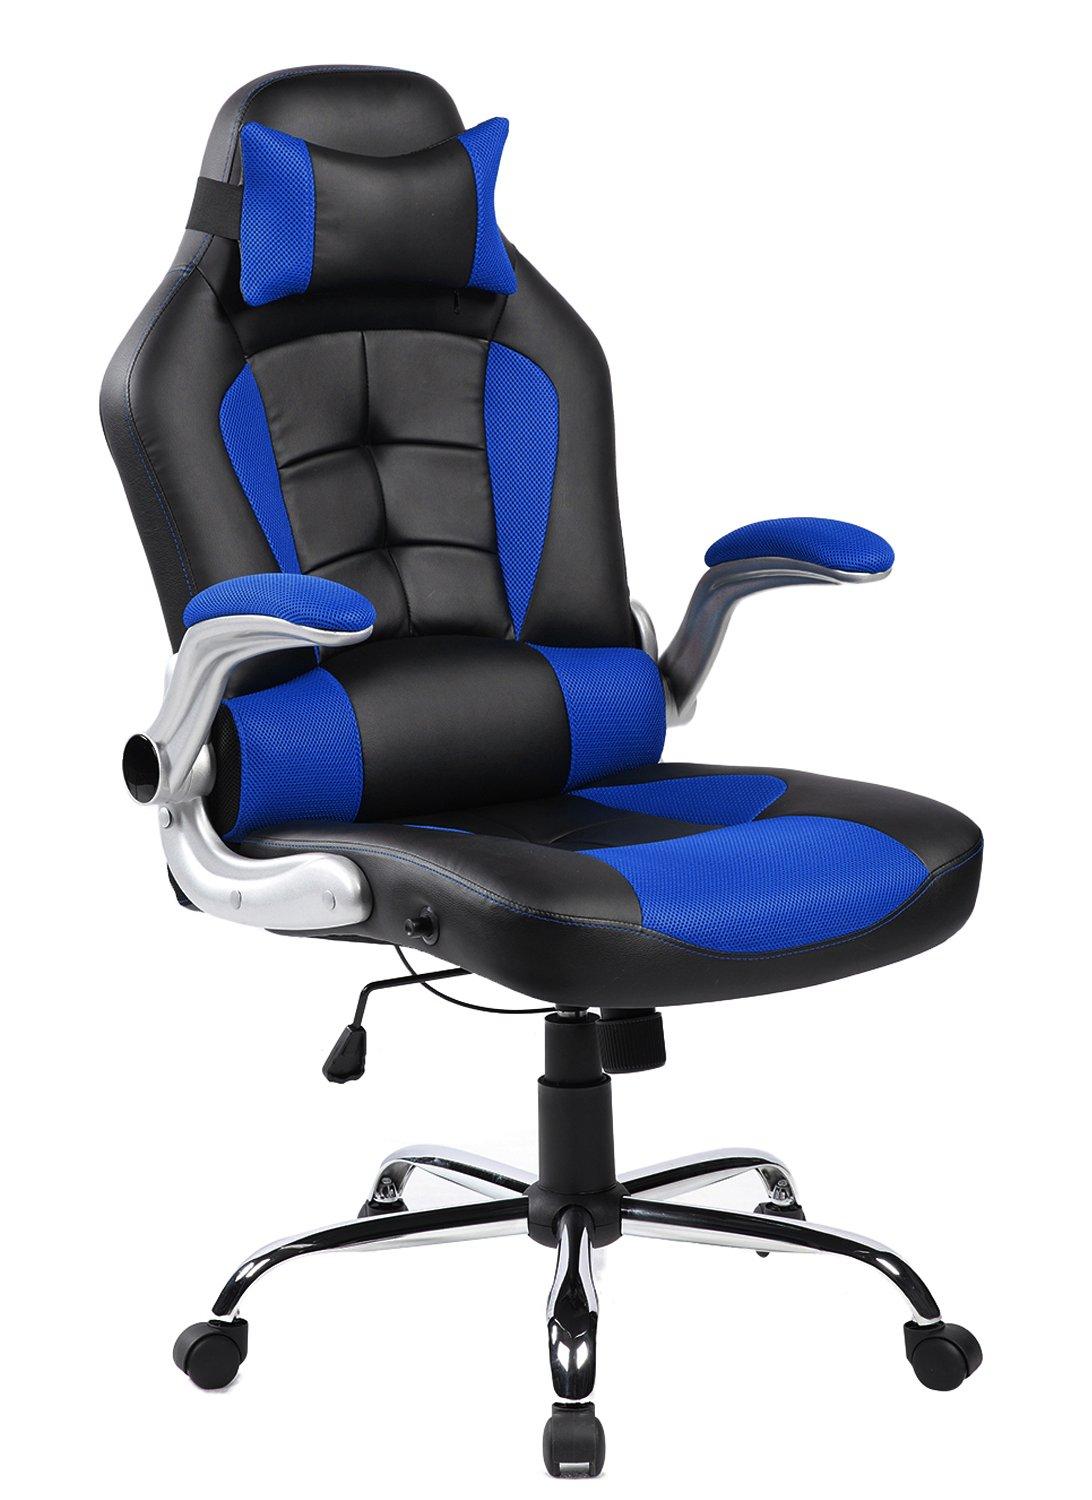 Merax High-Back Ergonomic Pu Swivel Chair Computer Desk Lumbar Support Chair Napping Chair (Blue and Black) PP005685CAA